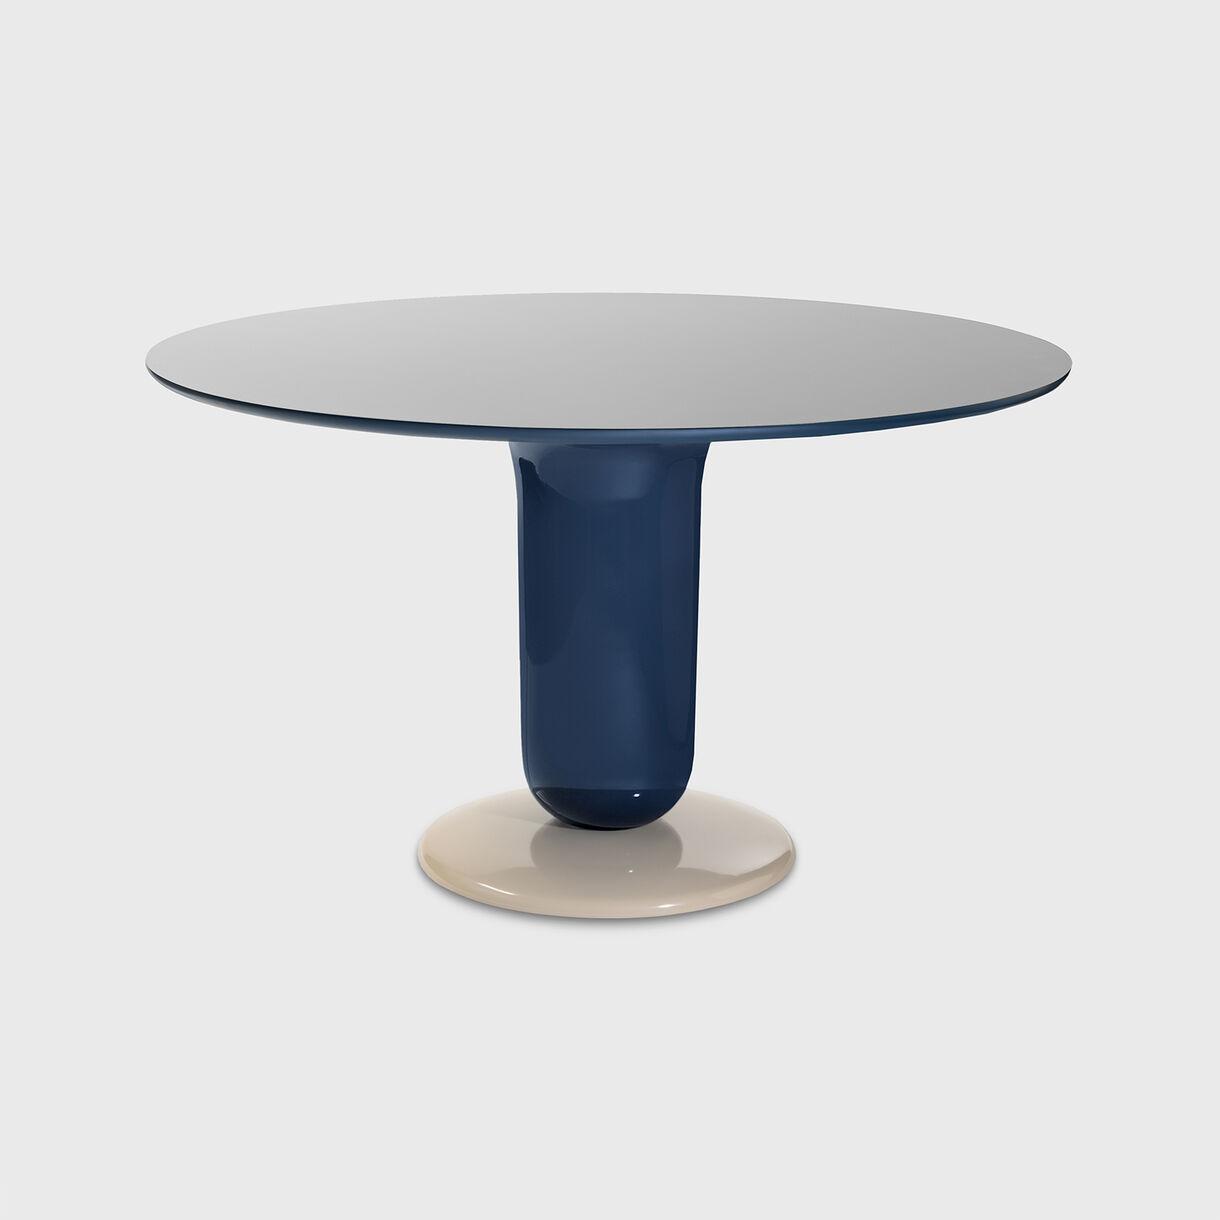 Explorer 4 Dining Table, Multicolour Blue